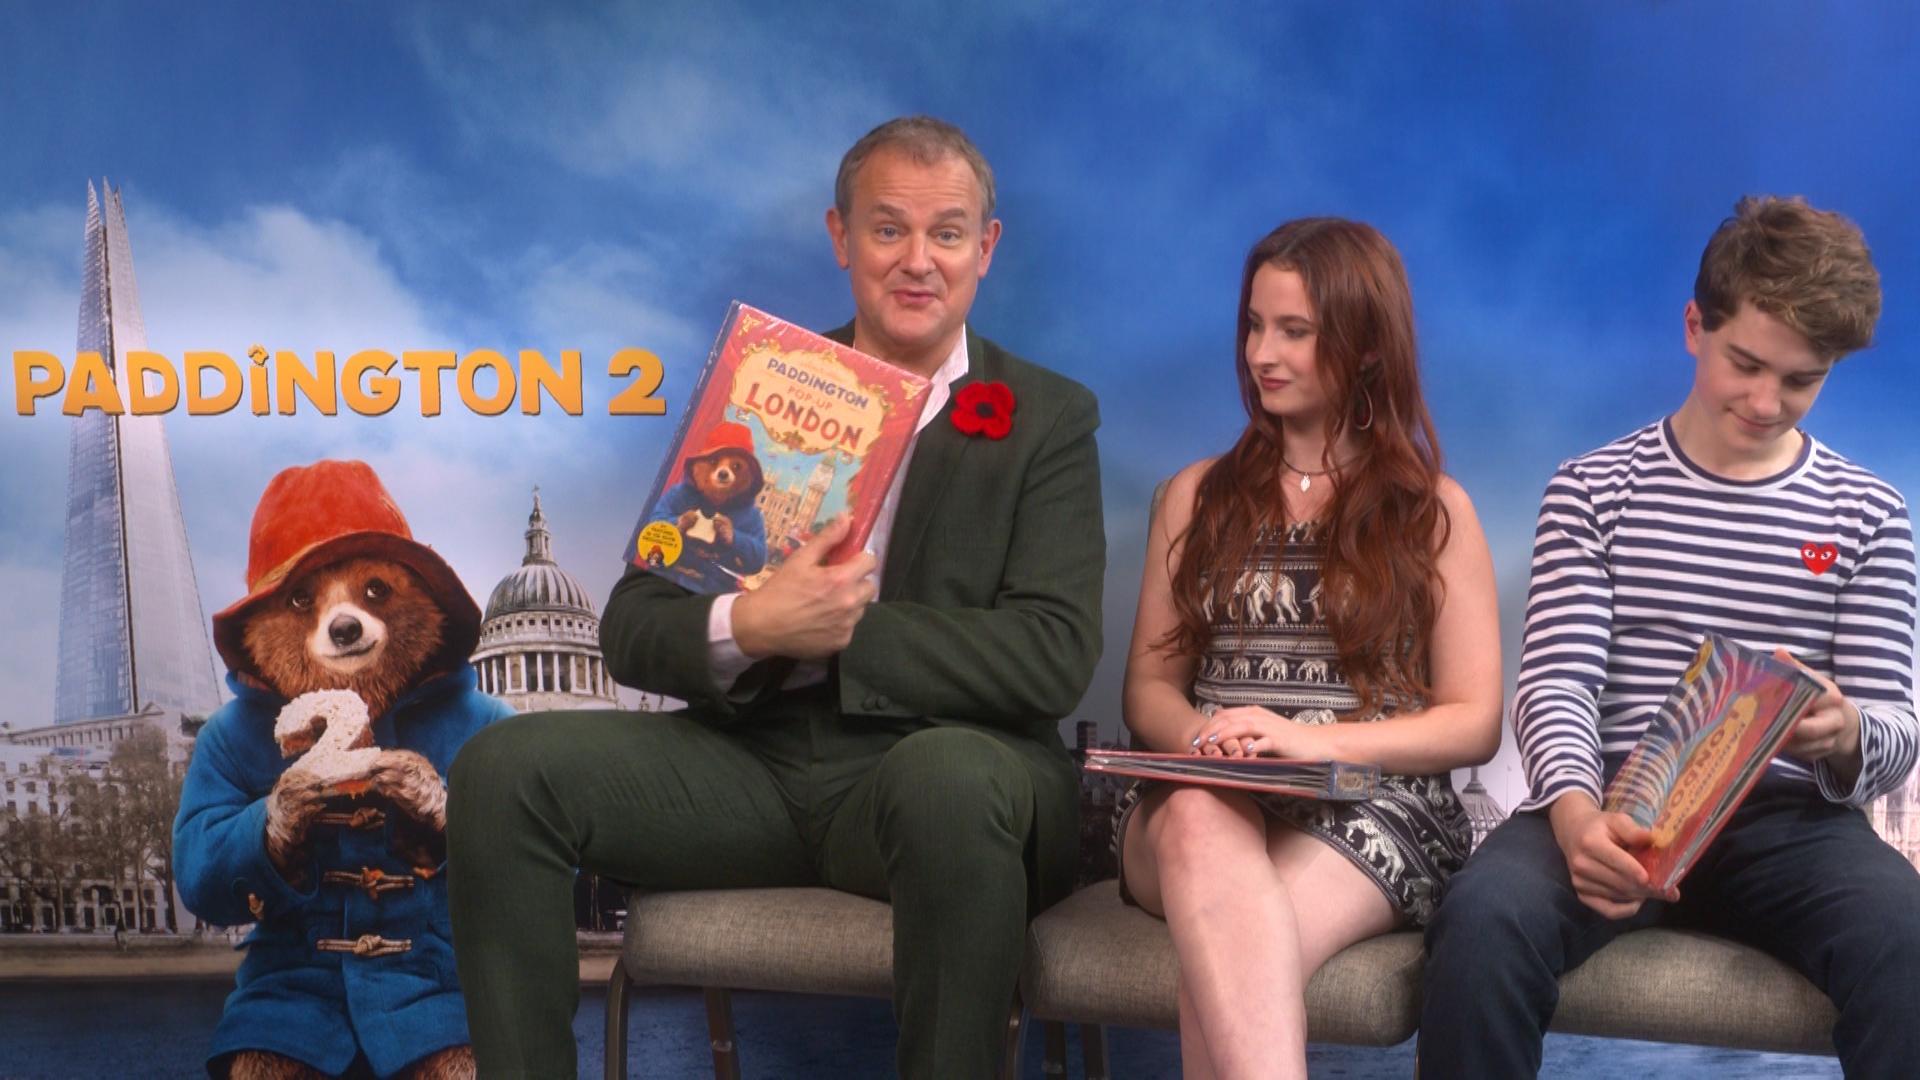 Paddington 2 Pop-Up Book - Hugh Bonneville, Madeleine Harris, Samuel Joslin